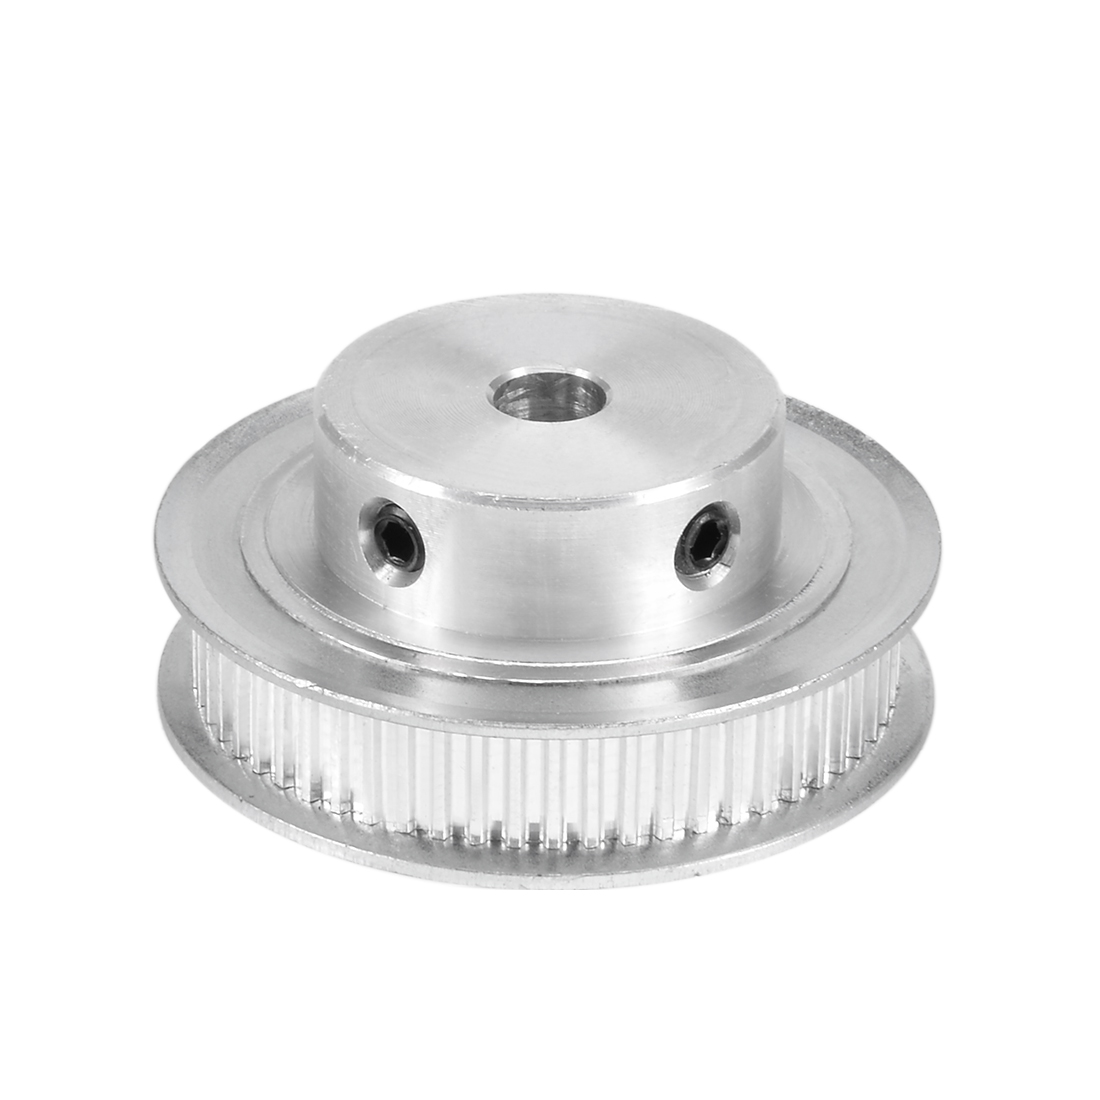 Aluminum MXL 60 Teeth 6mm Bore 7mm Belt Timing Idler Pulley Synchronous Wheel